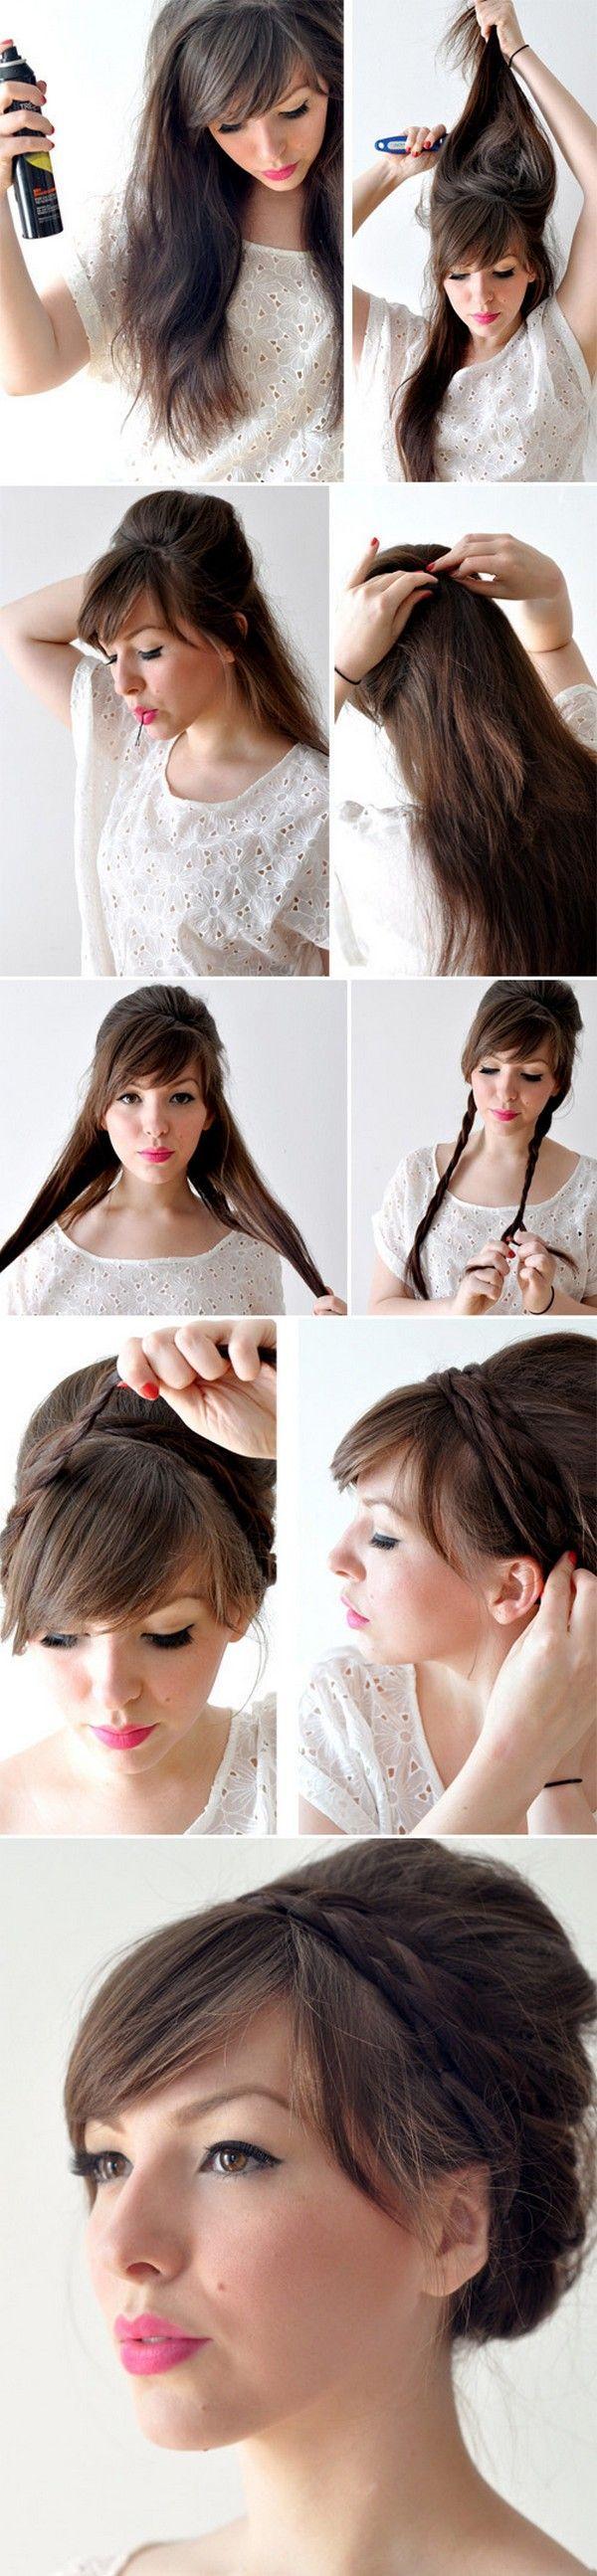 Phenomenal 1000 Ideas About Beehive Tutorial On Pinterest Easy Bun Short Hairstyles Gunalazisus